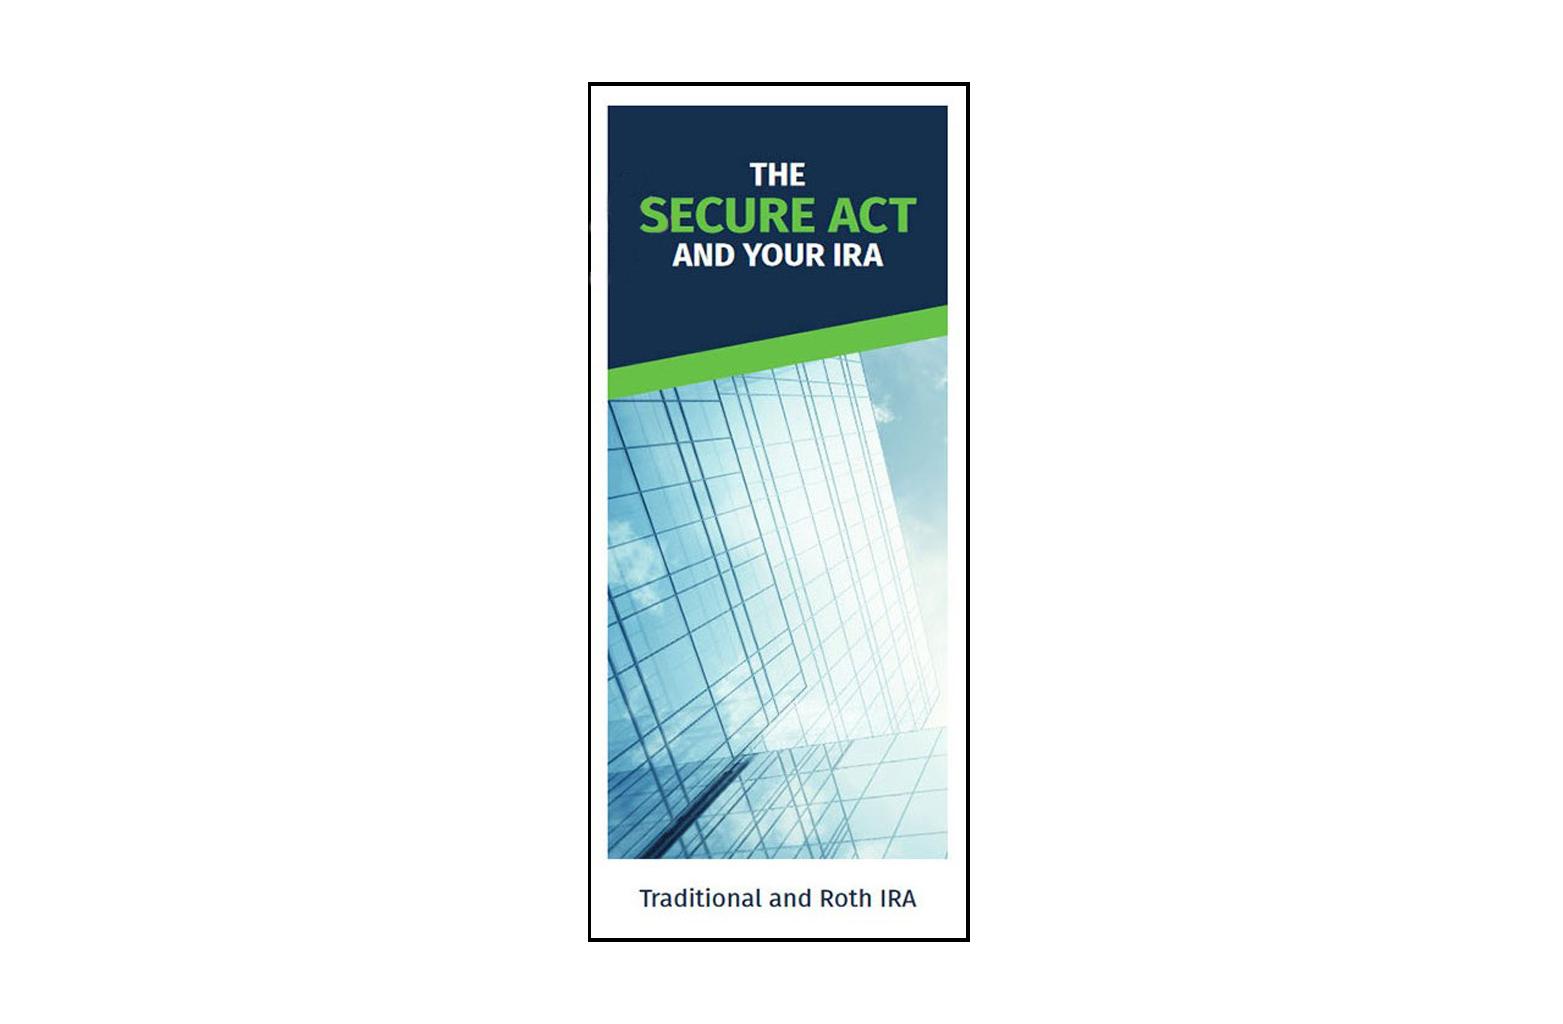 SECURE Act IRA Educational Brochure